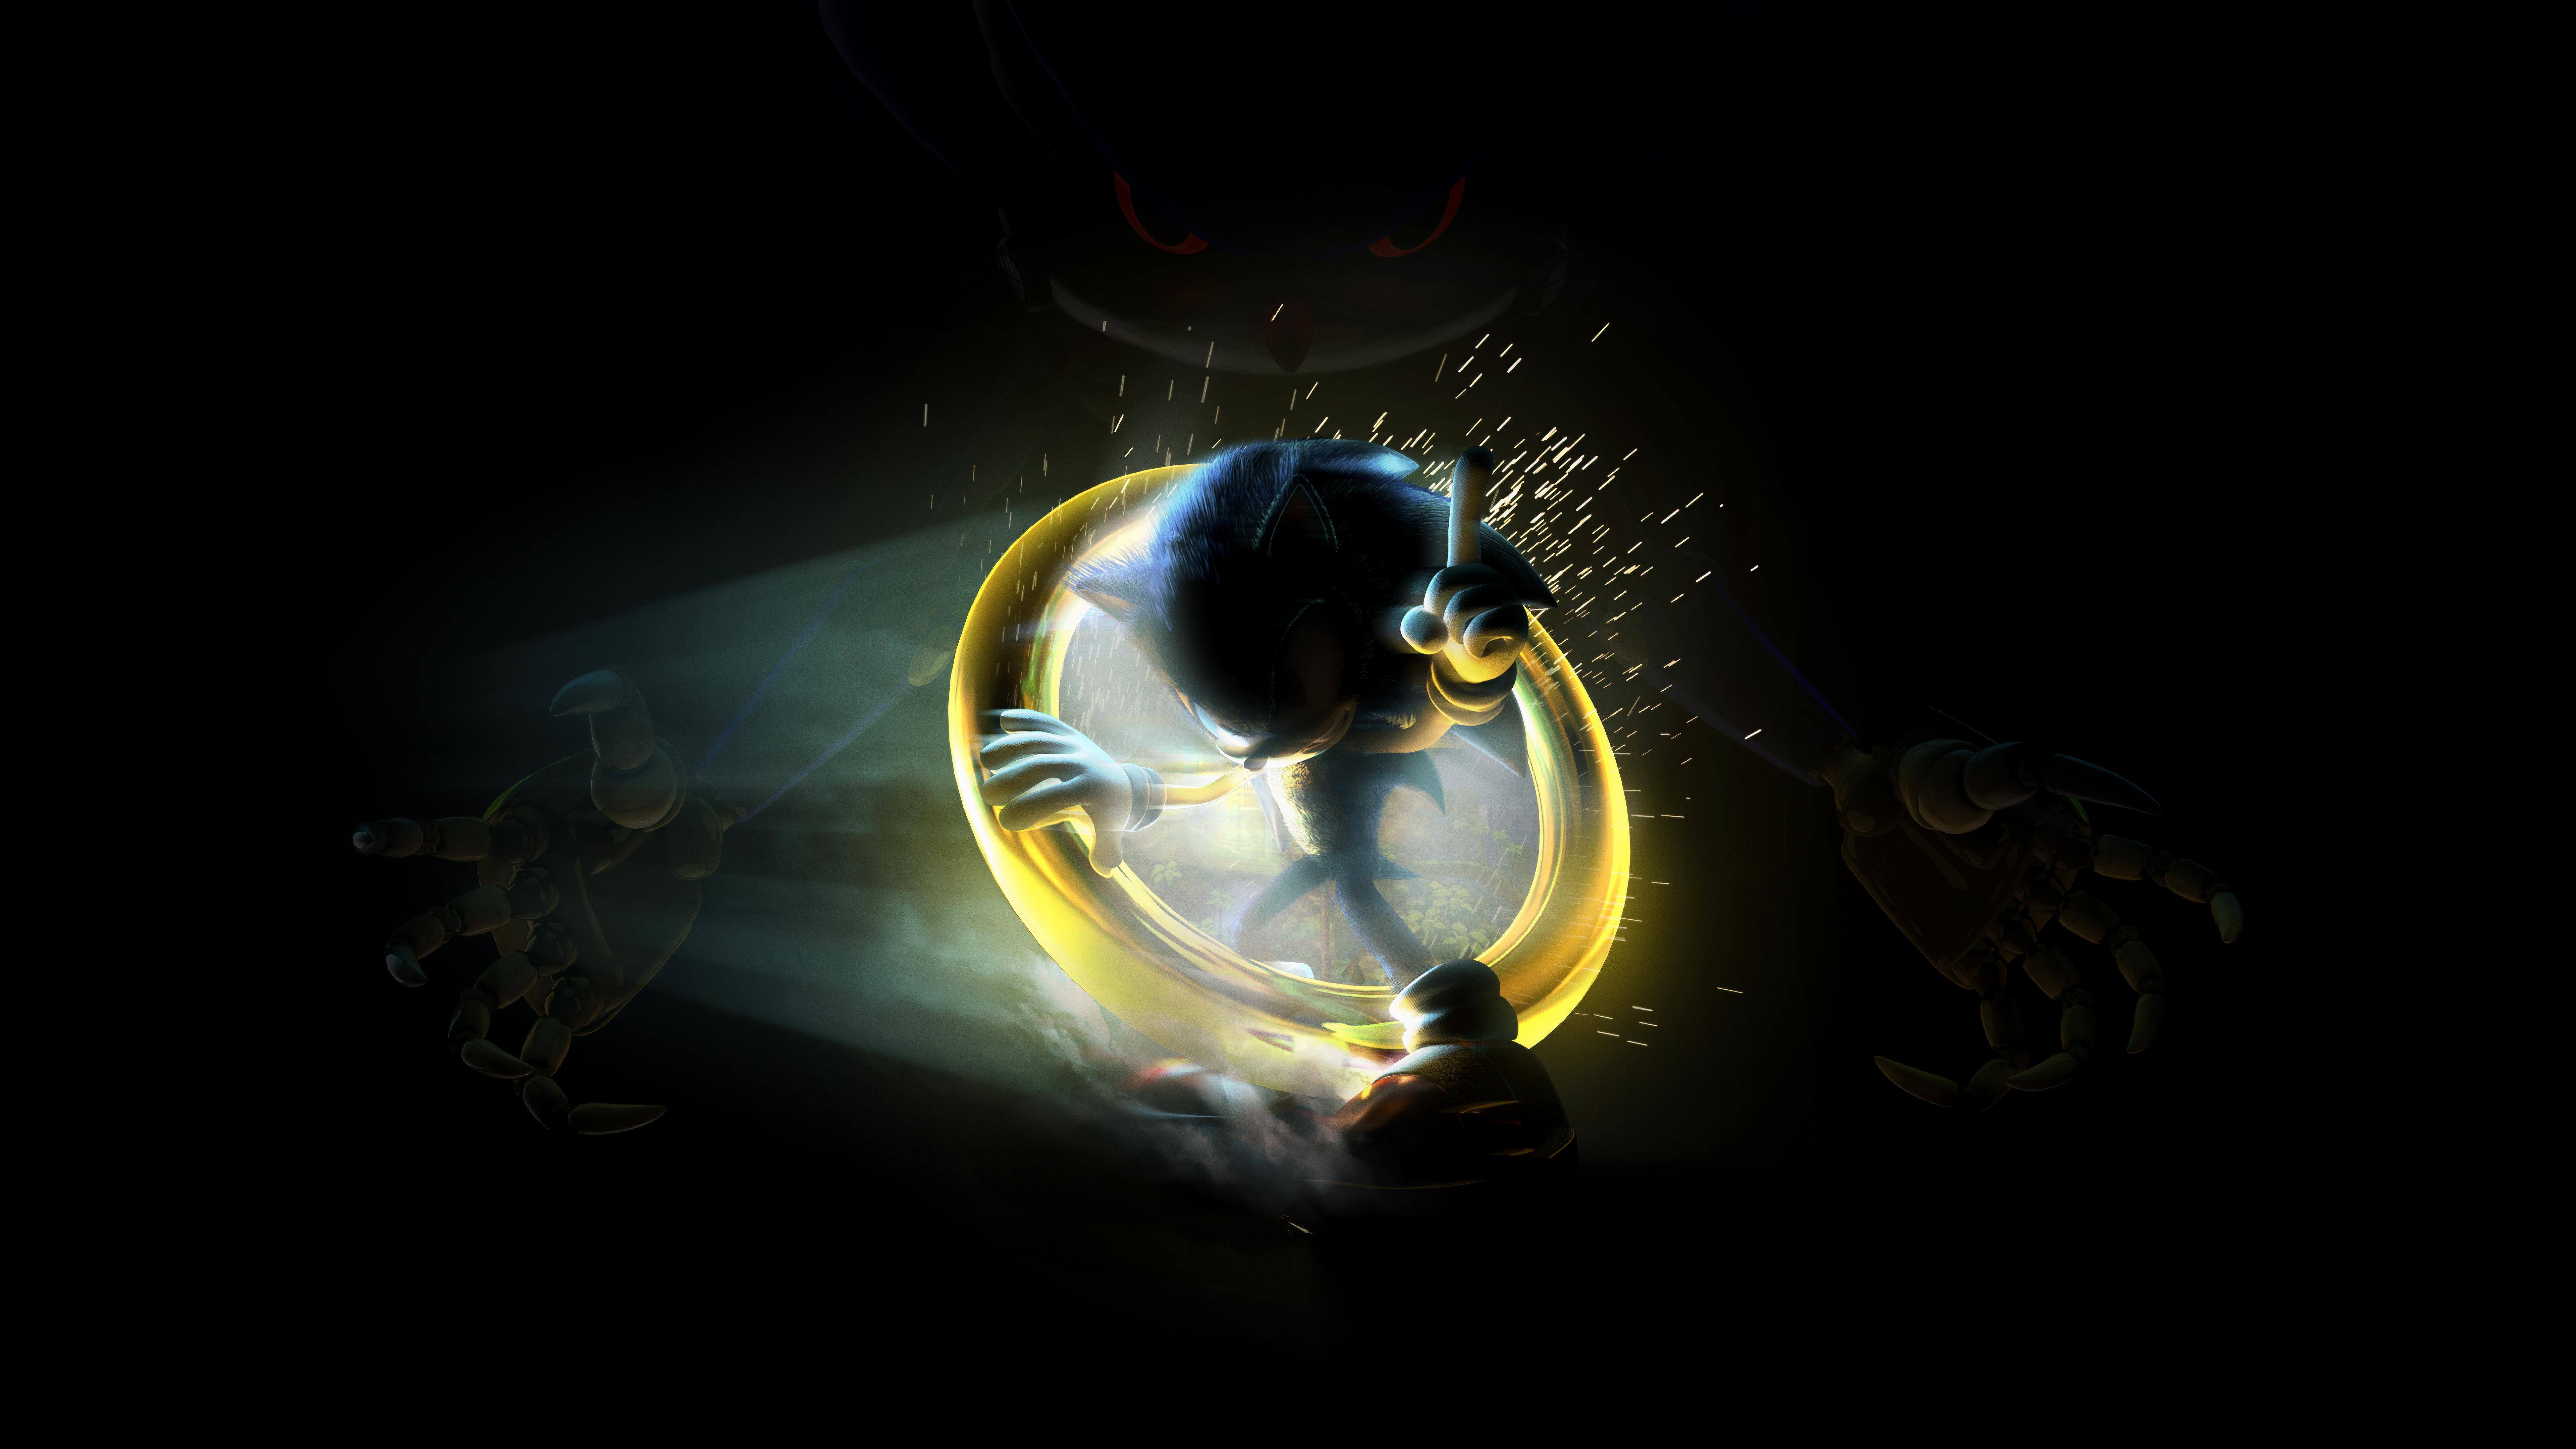 Sonic The Hedgehog 8k 2020 Movie Hd Movies 4k Wallpapers